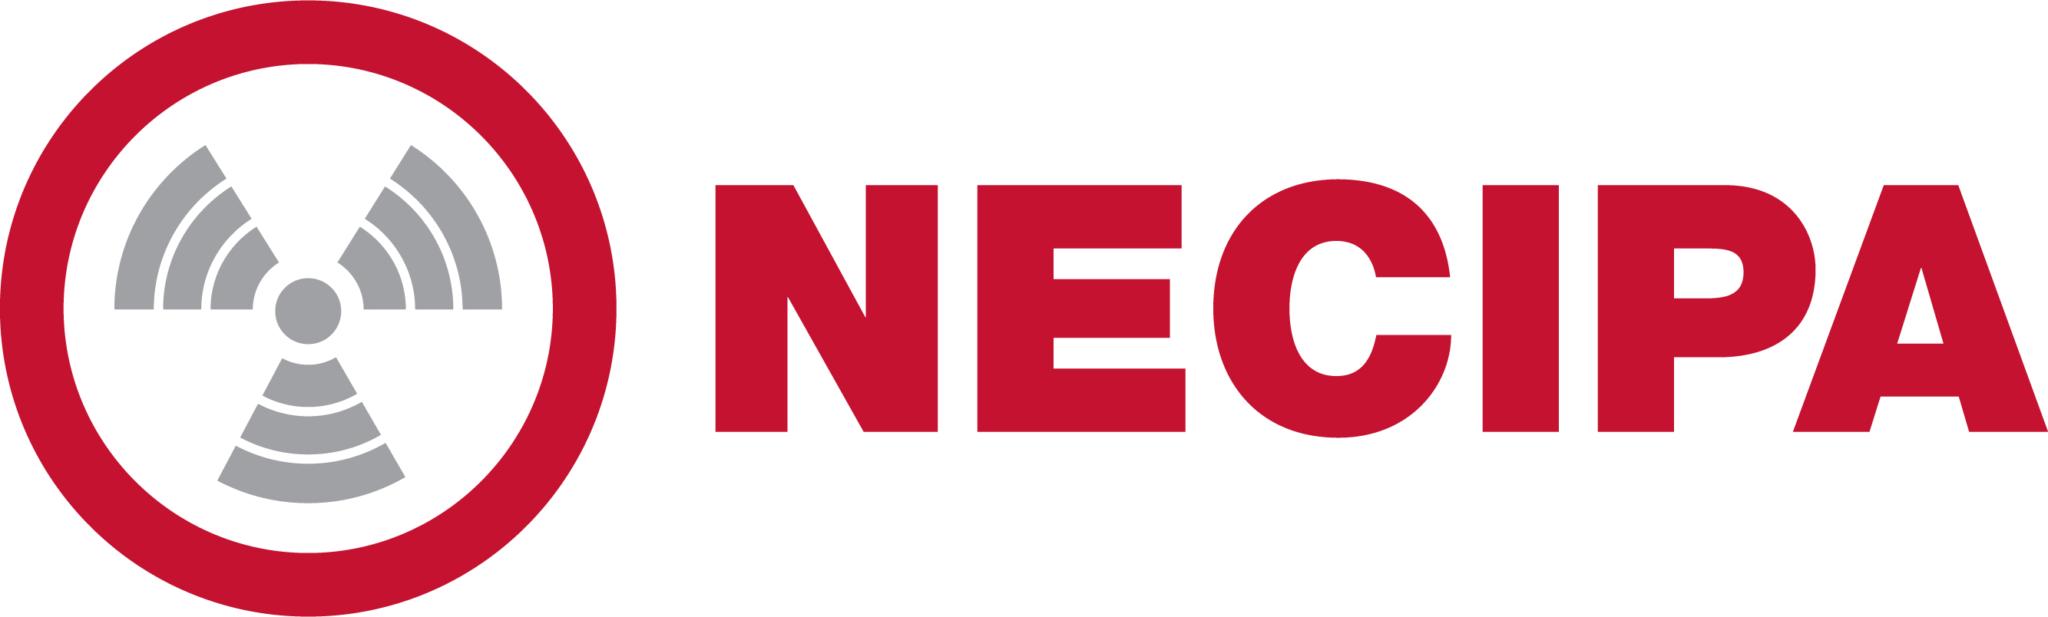 logomarca-necipa.png